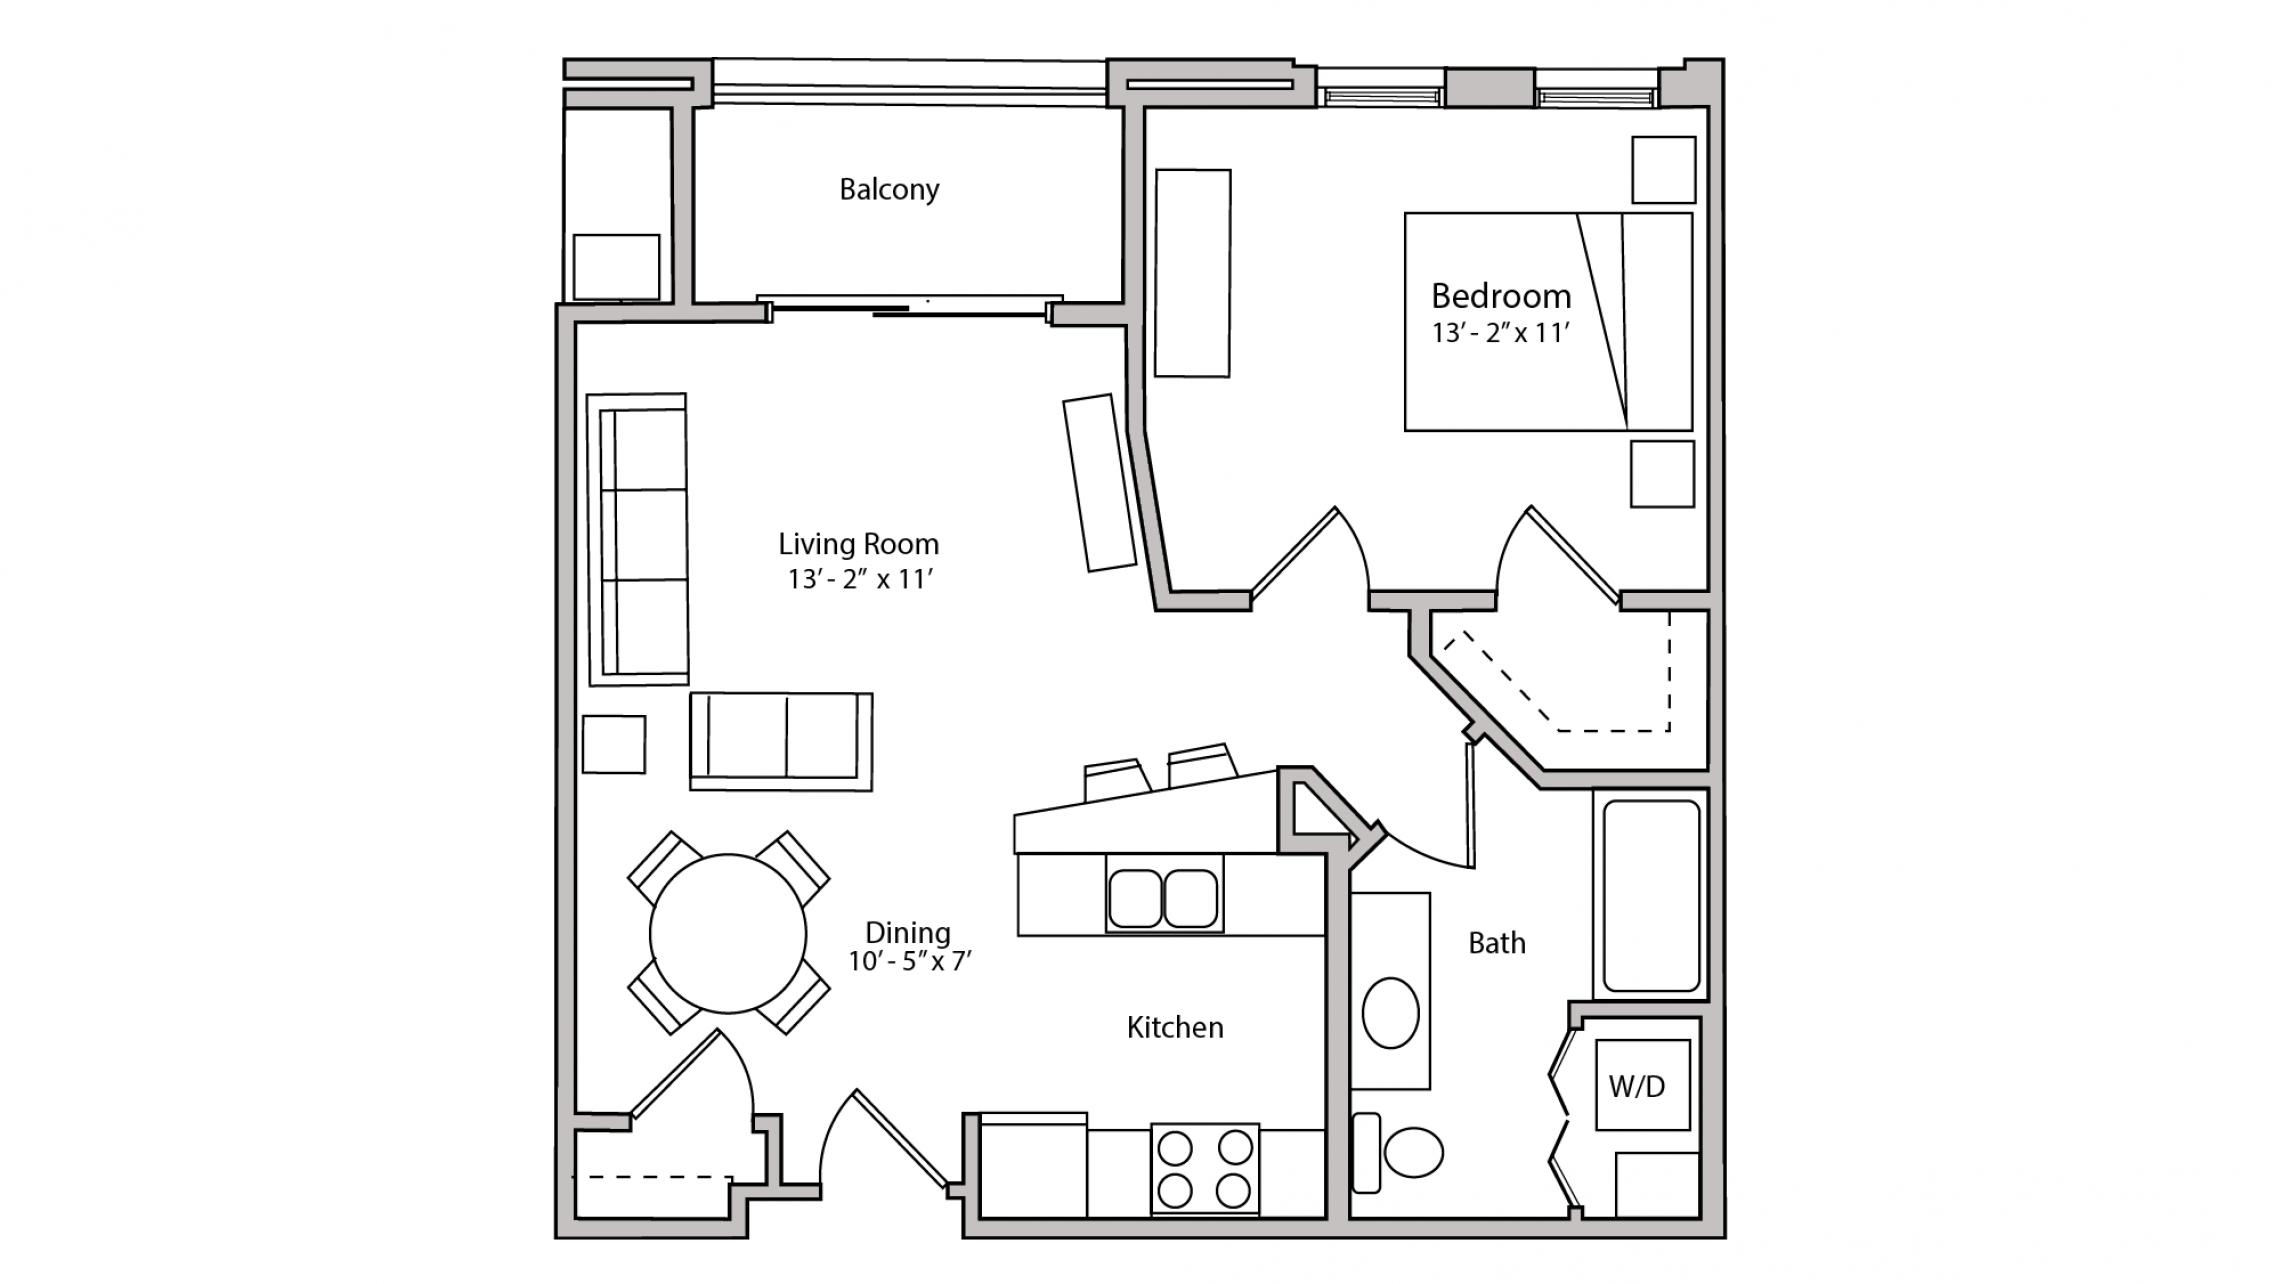 ULI The Depot 2-307 - One Bedroom, One Bathroom